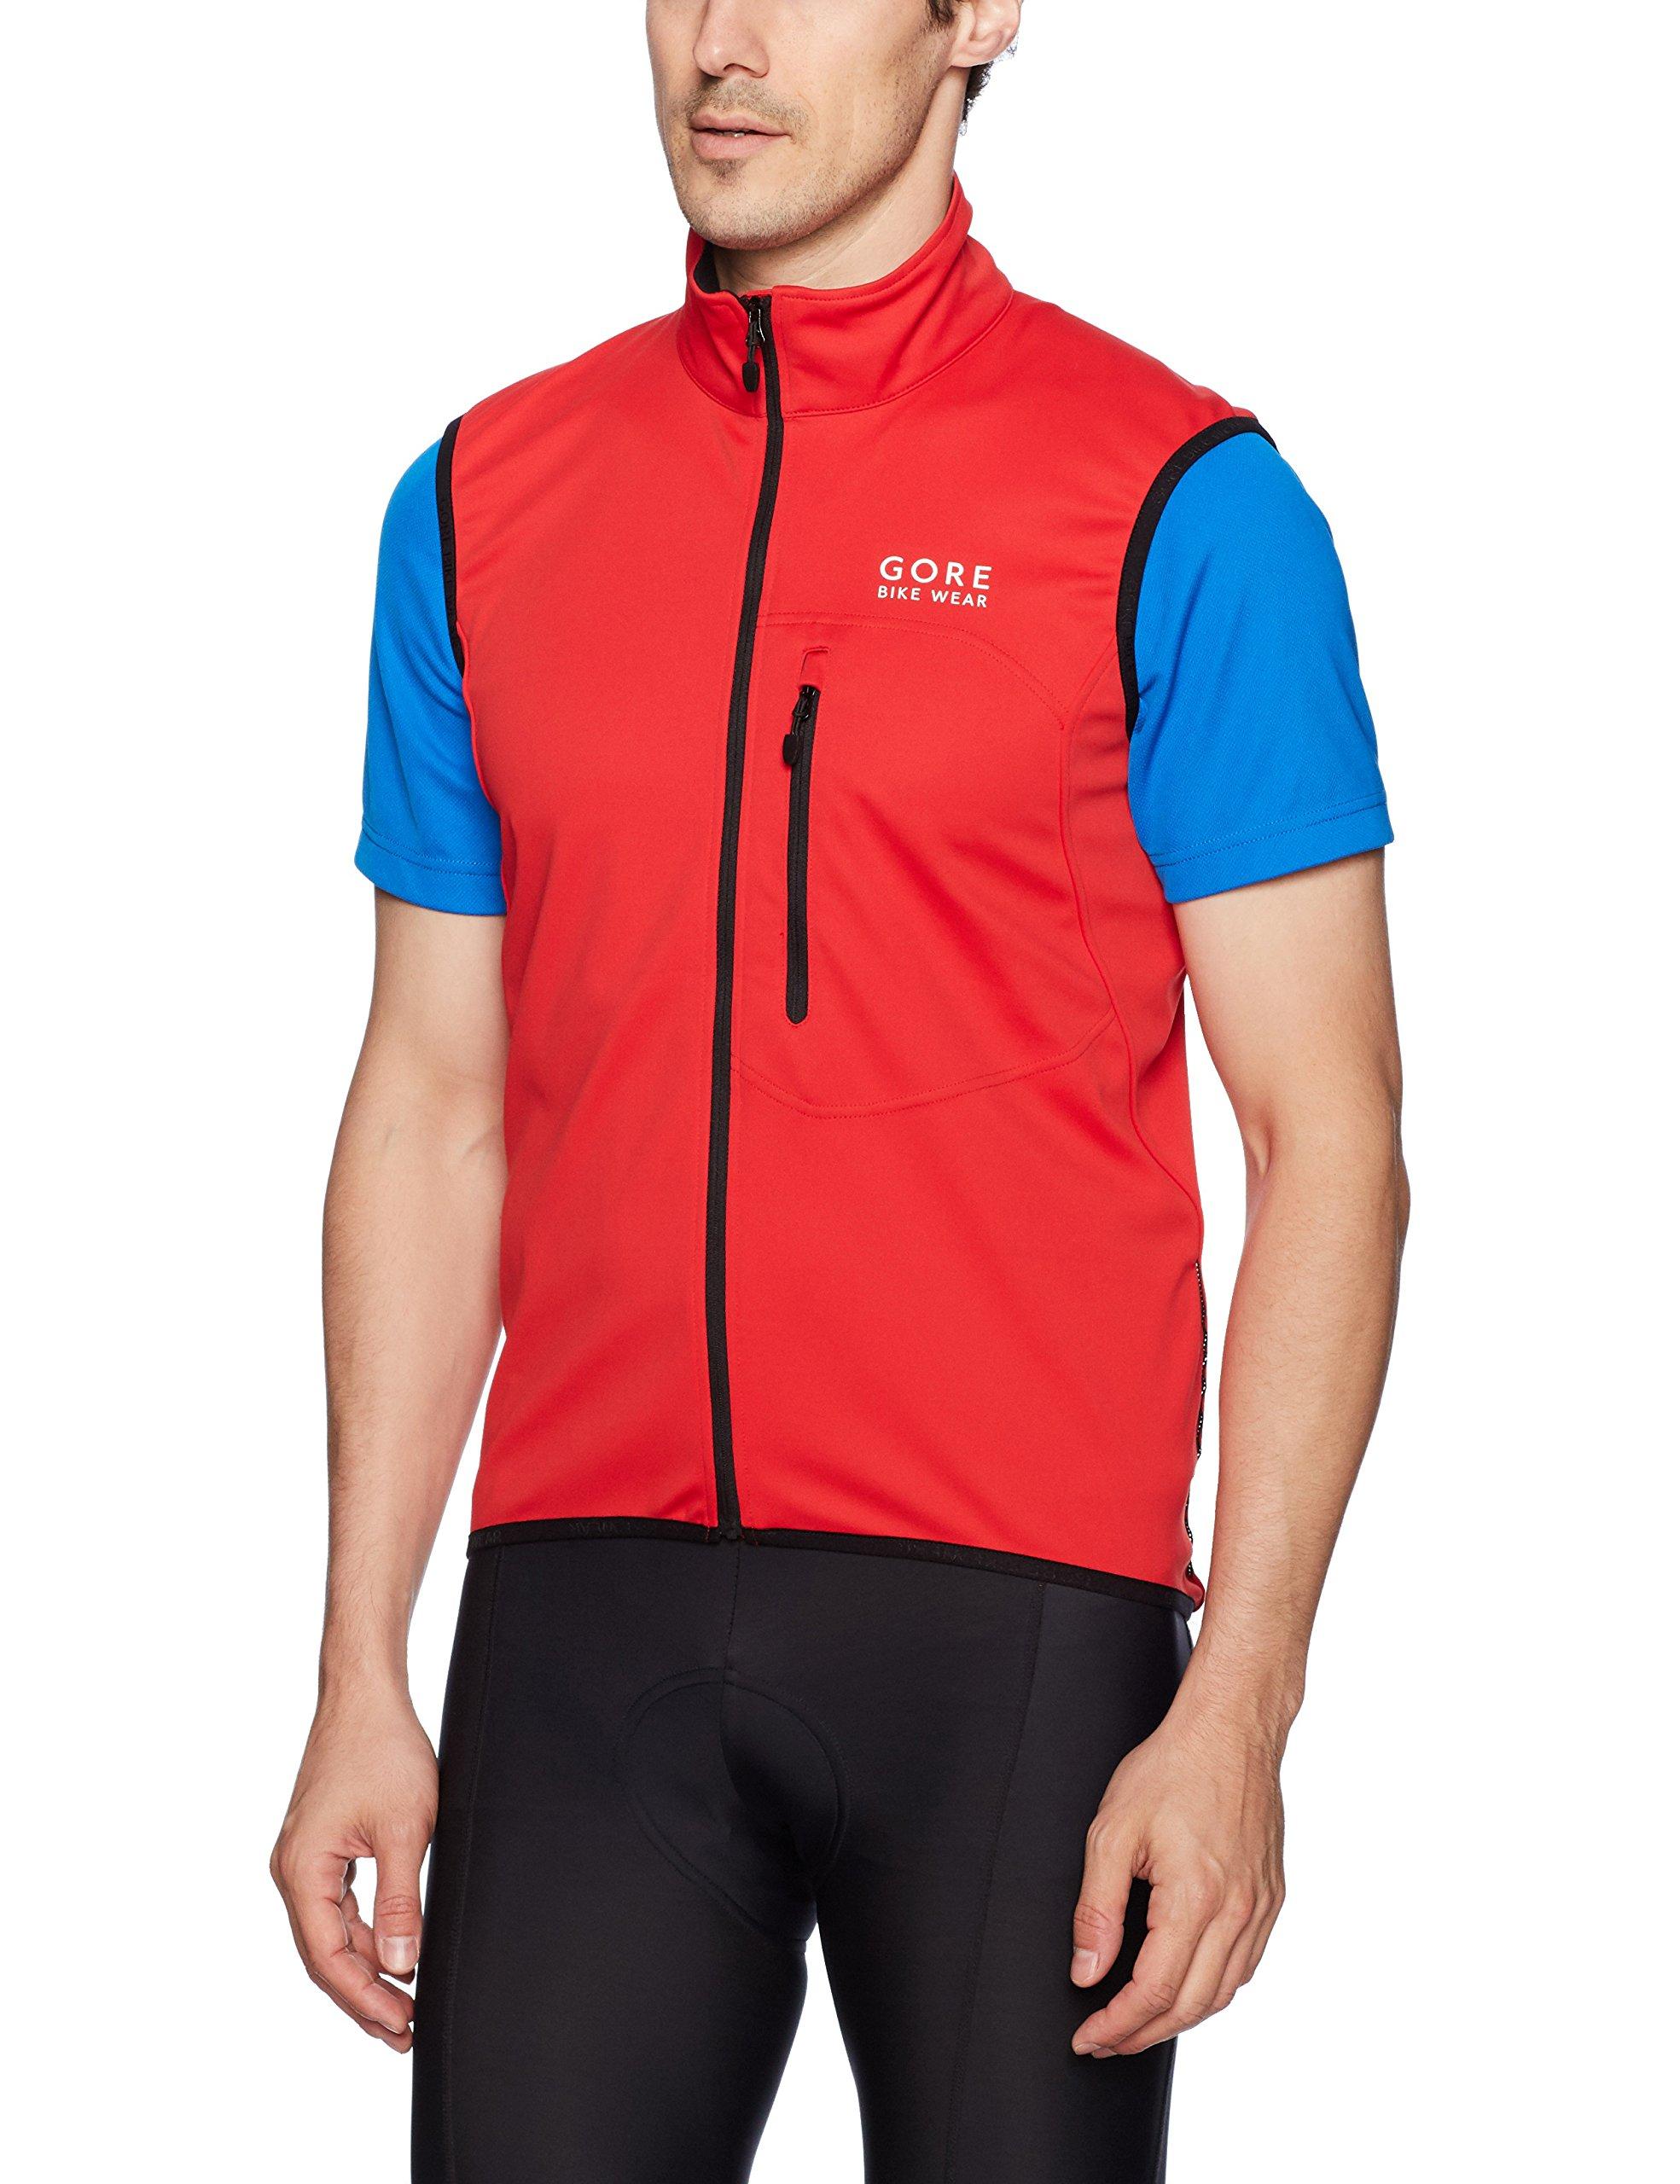 GORE BIKE WEAR Men's Soft Shell Cycling Vest, GORE WINDSTOPPER,  Vest, Size: XL, Red, VWELEM